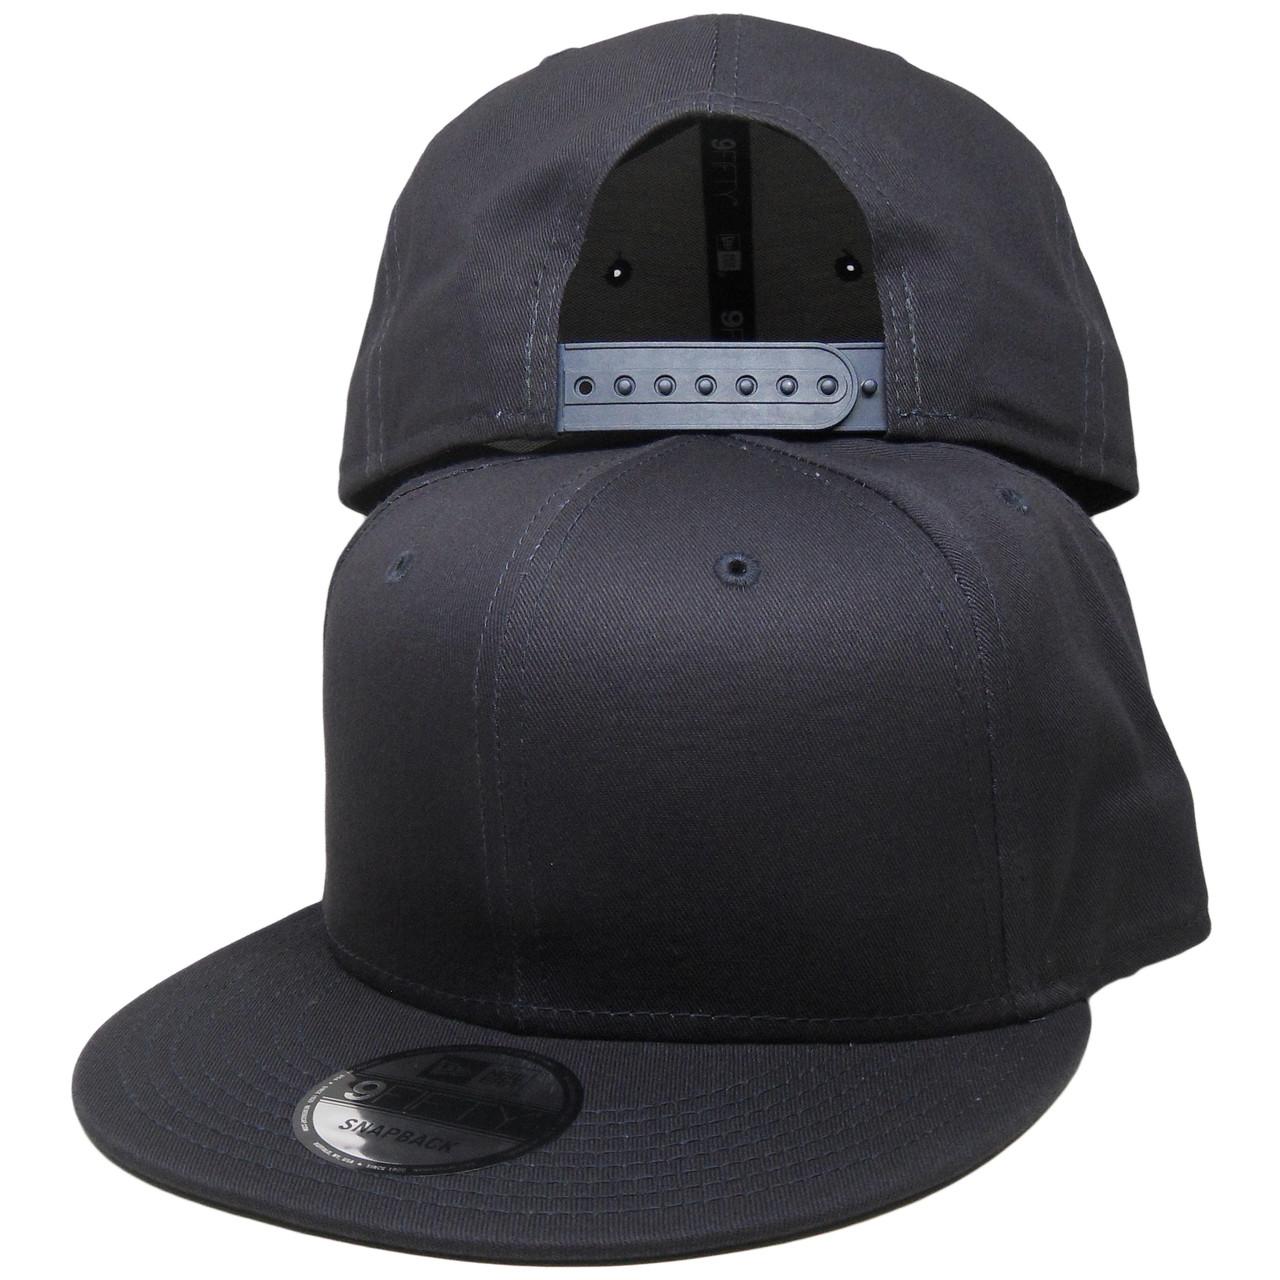 745c5ca81 Plain Blank New Era 9Fifty Snapback Hat - All Navy Blue